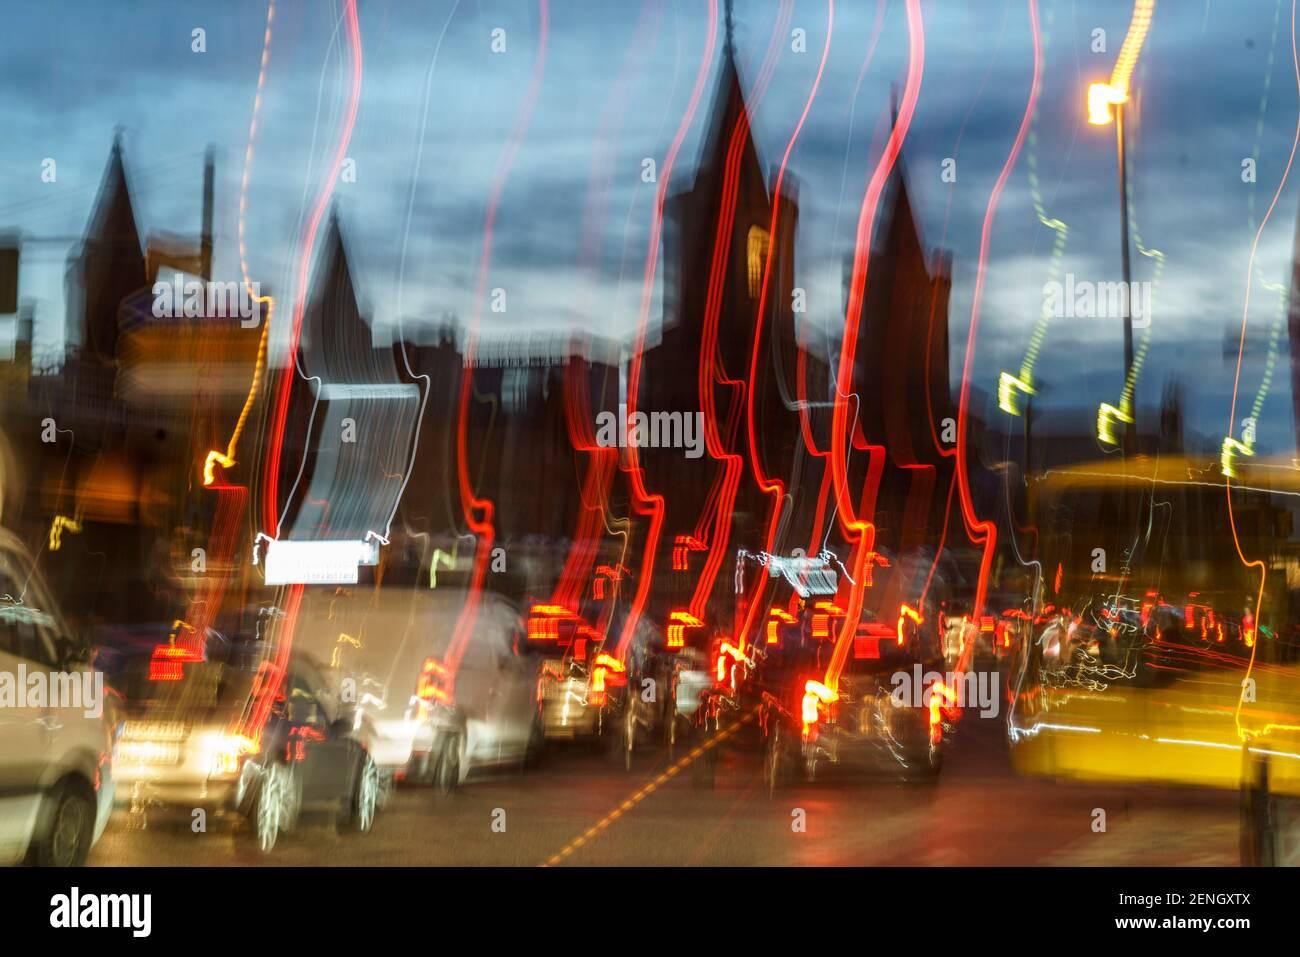 Oberbaumbruecke, Verkehrschaos, Stau, rush hour, verwischt, Schienenersatzverkehr U1, U3, Berlin Stock Photo